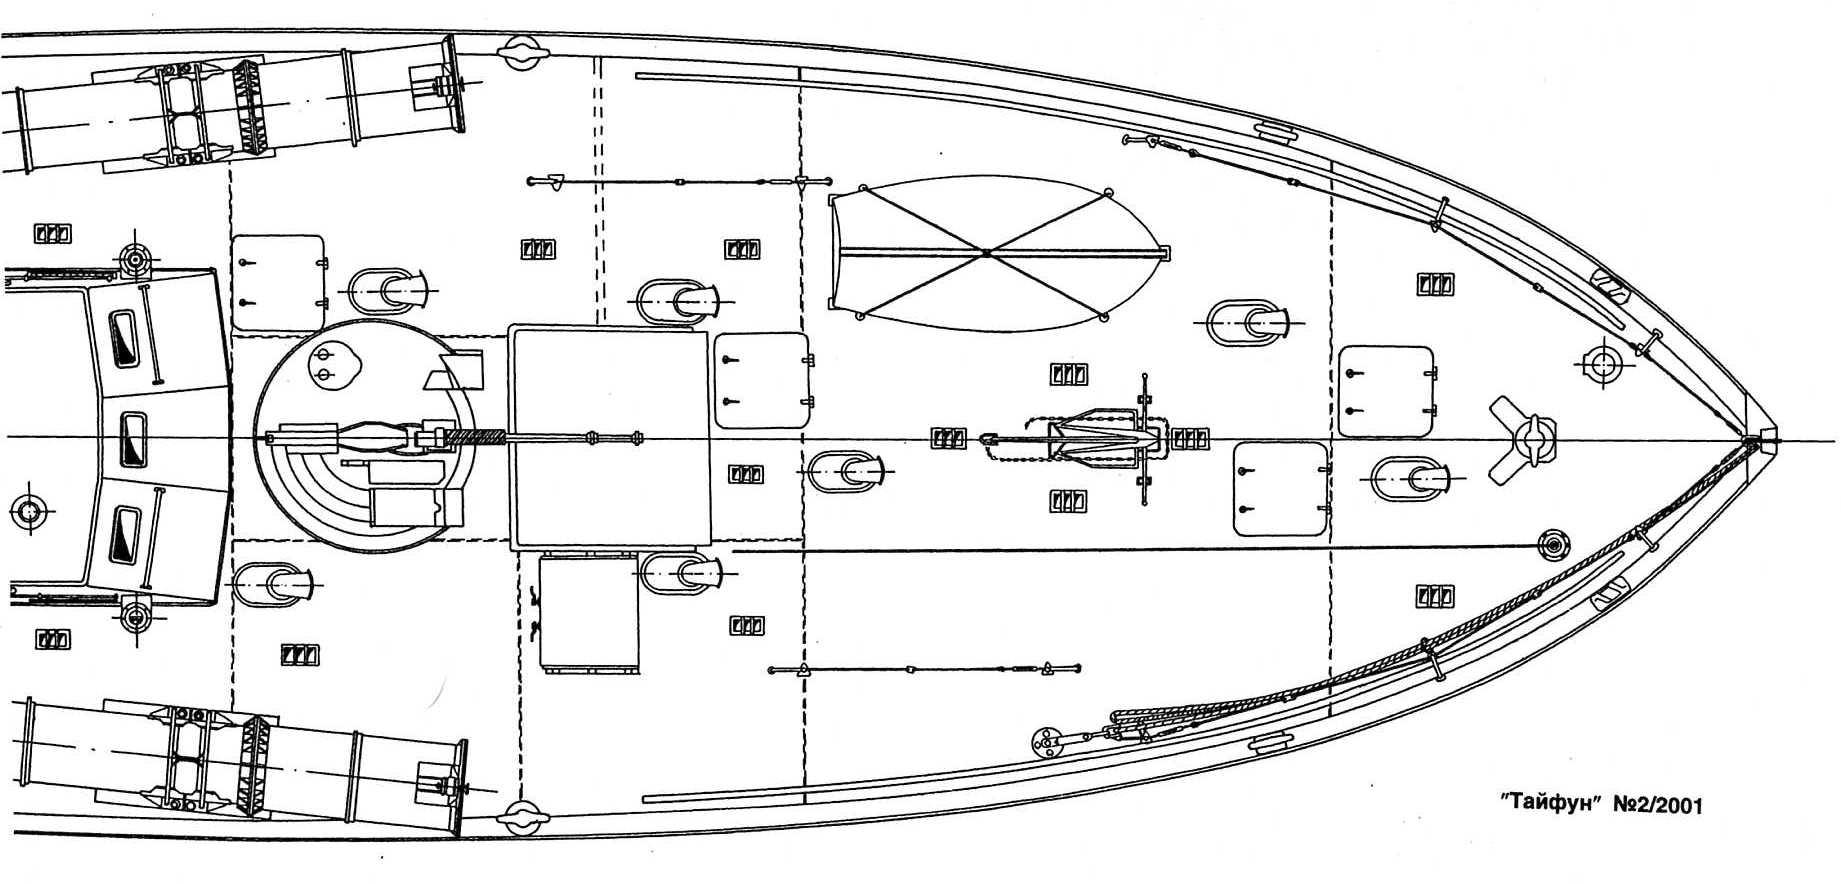 btk 183  -4.jpg